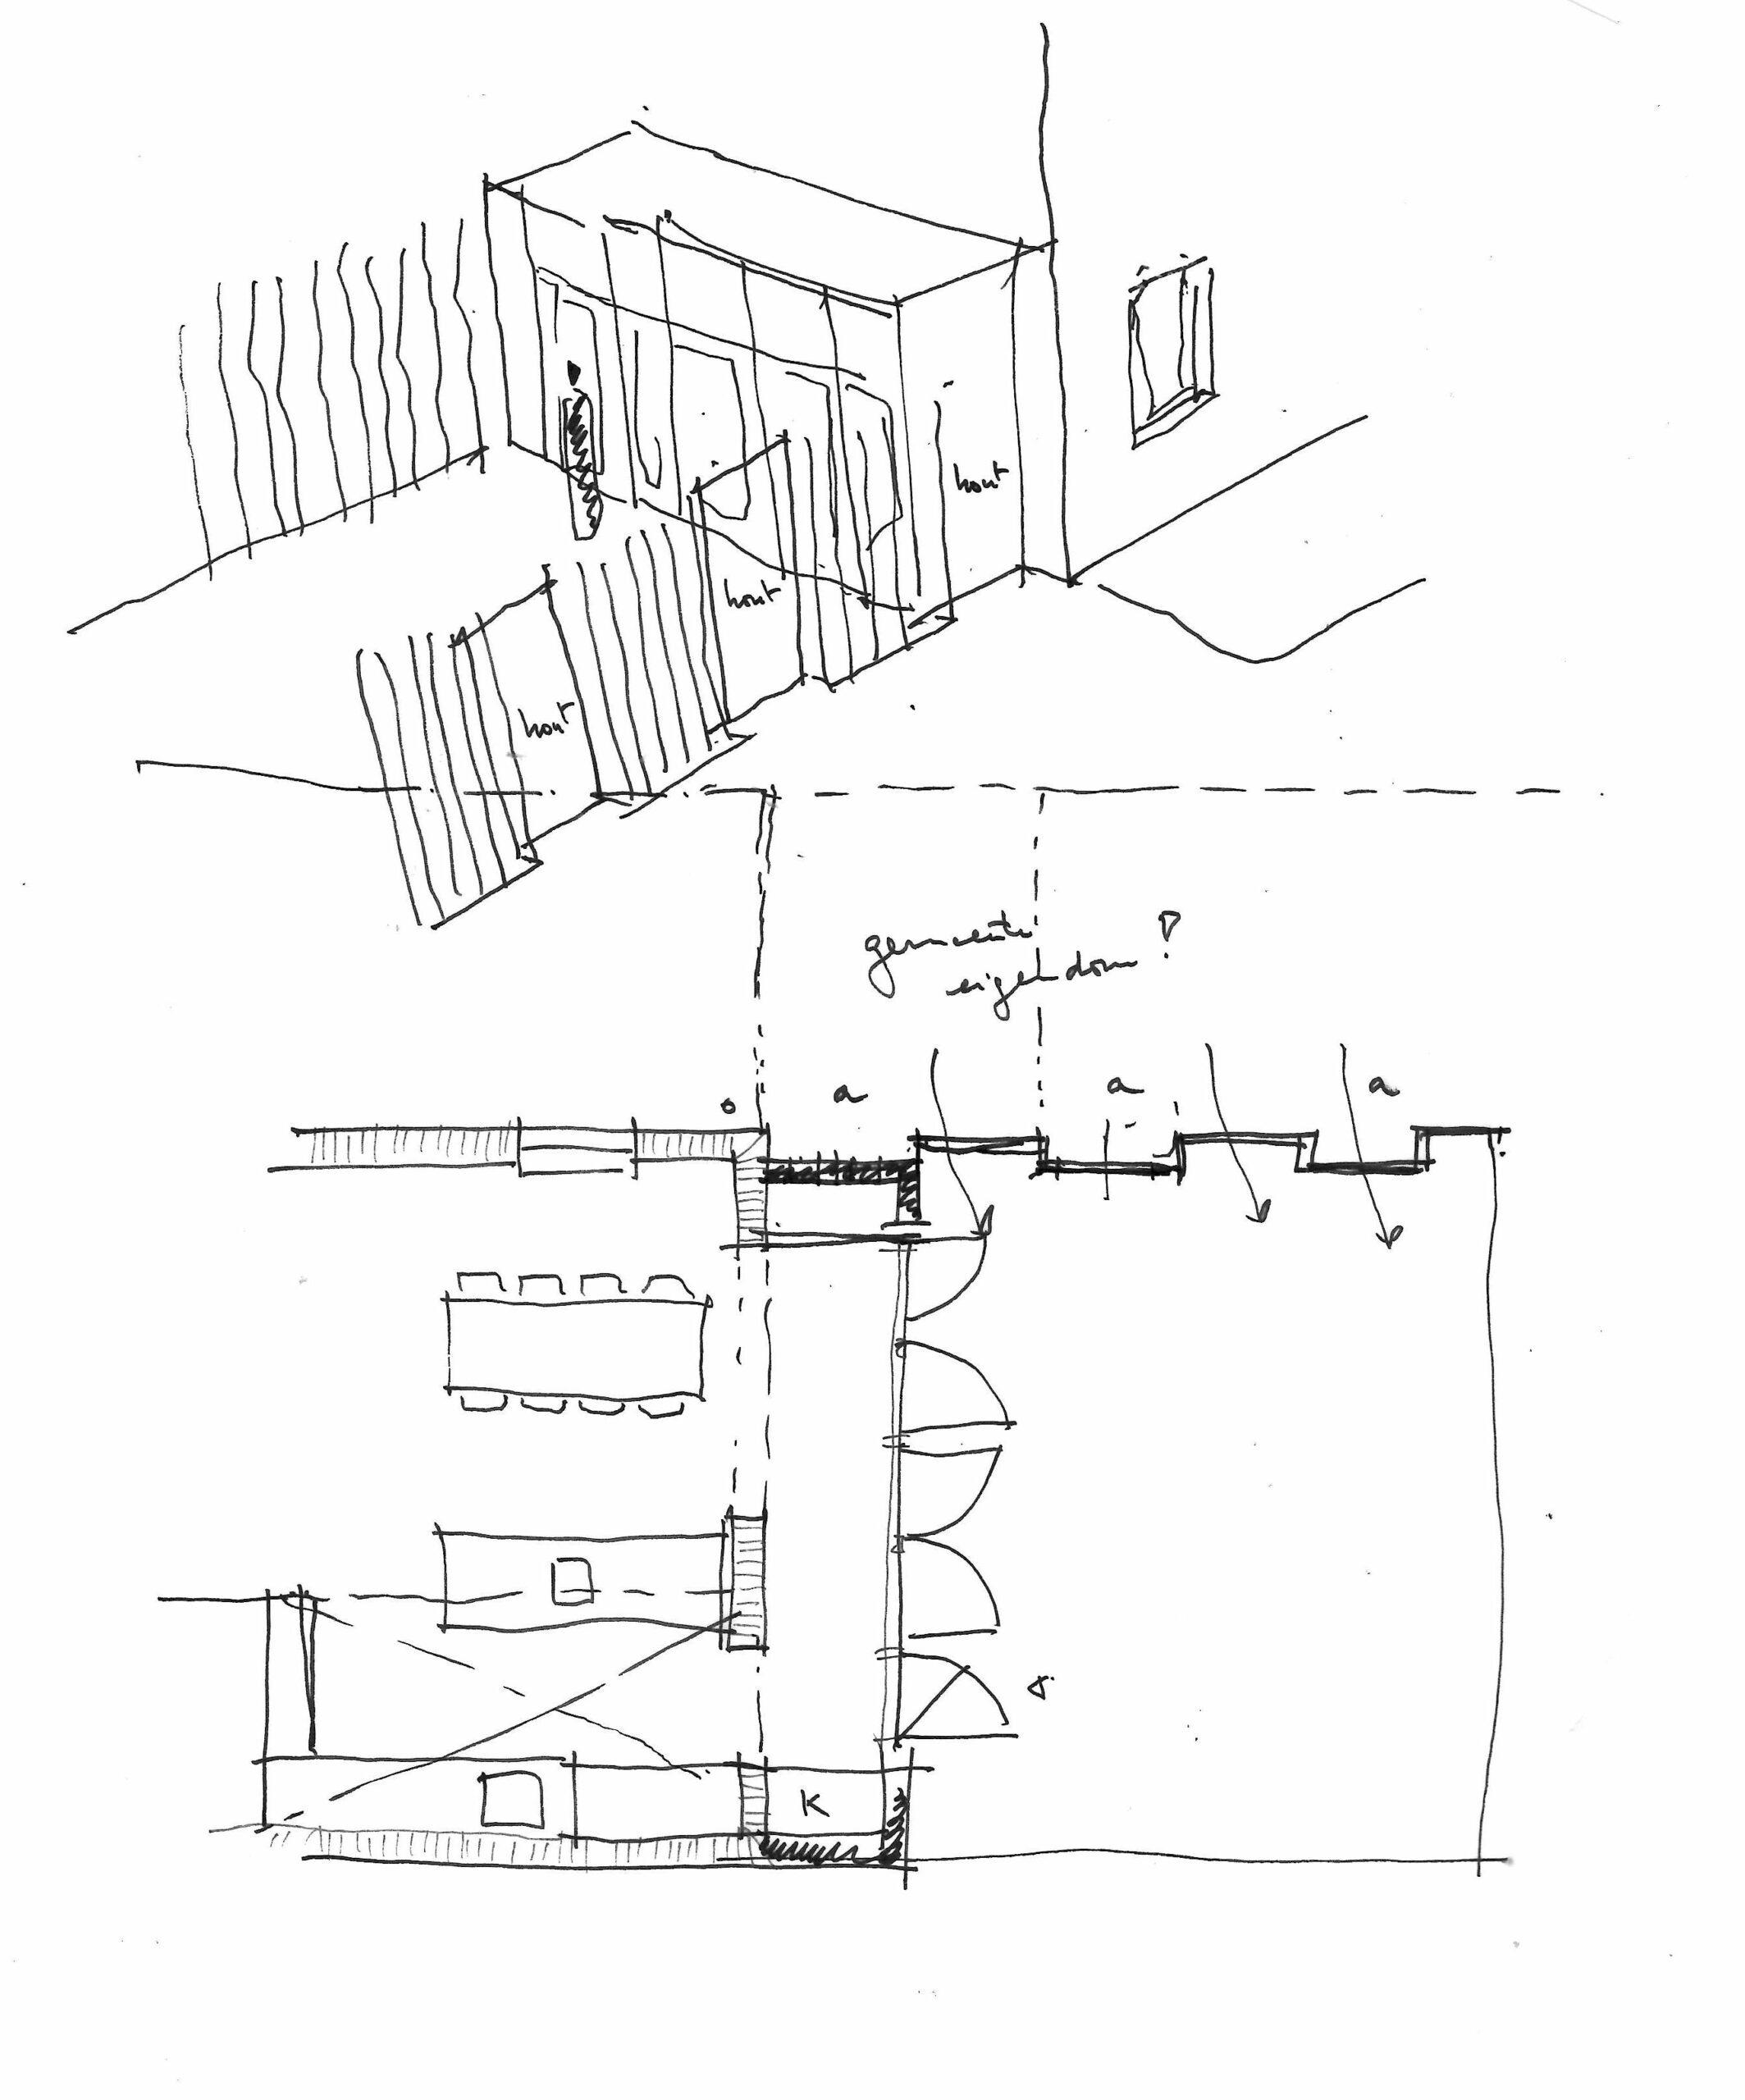 pr architectenburo - Schets